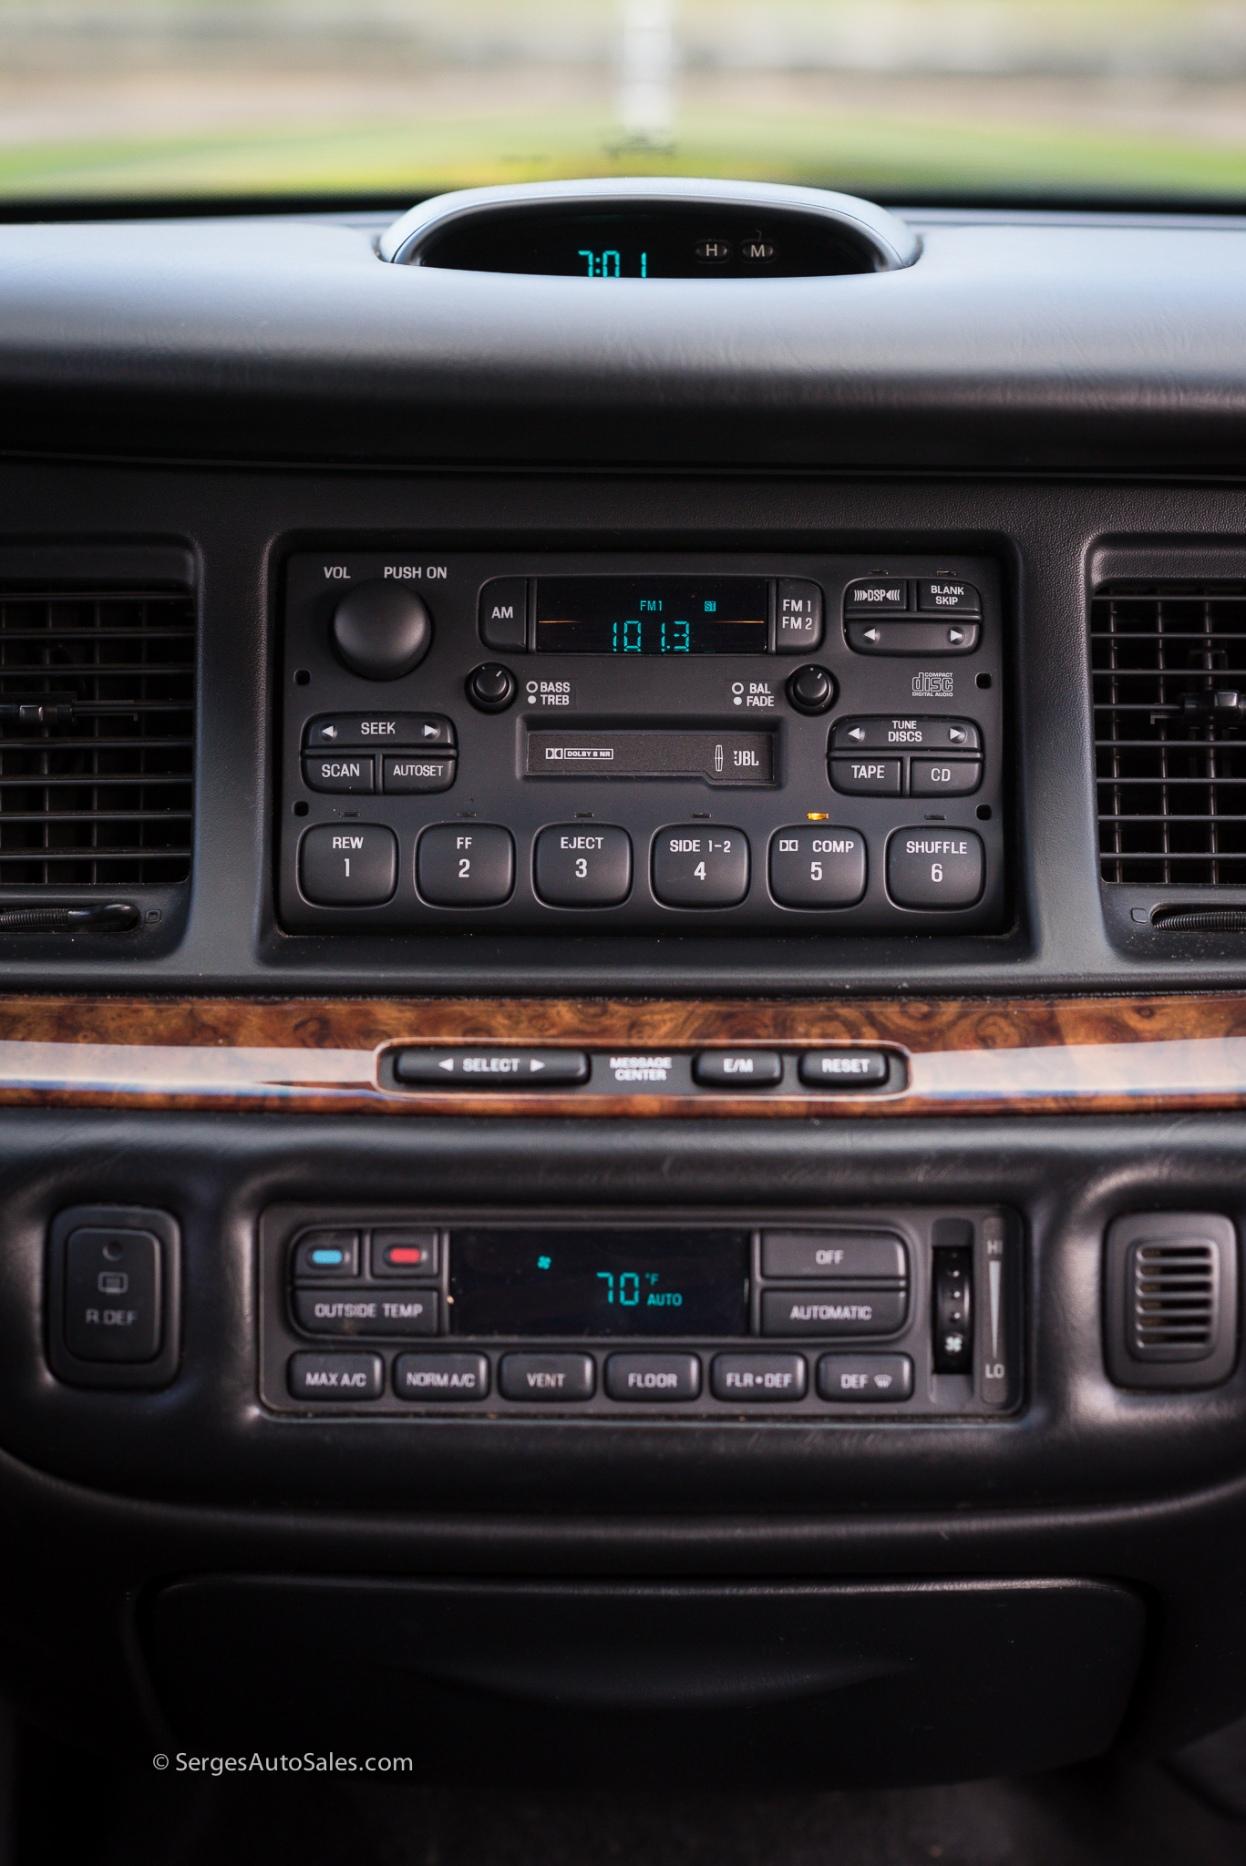 Lincon-town-car-for-sale-classic-1997-serges-auto-sales-pennsylvania-37